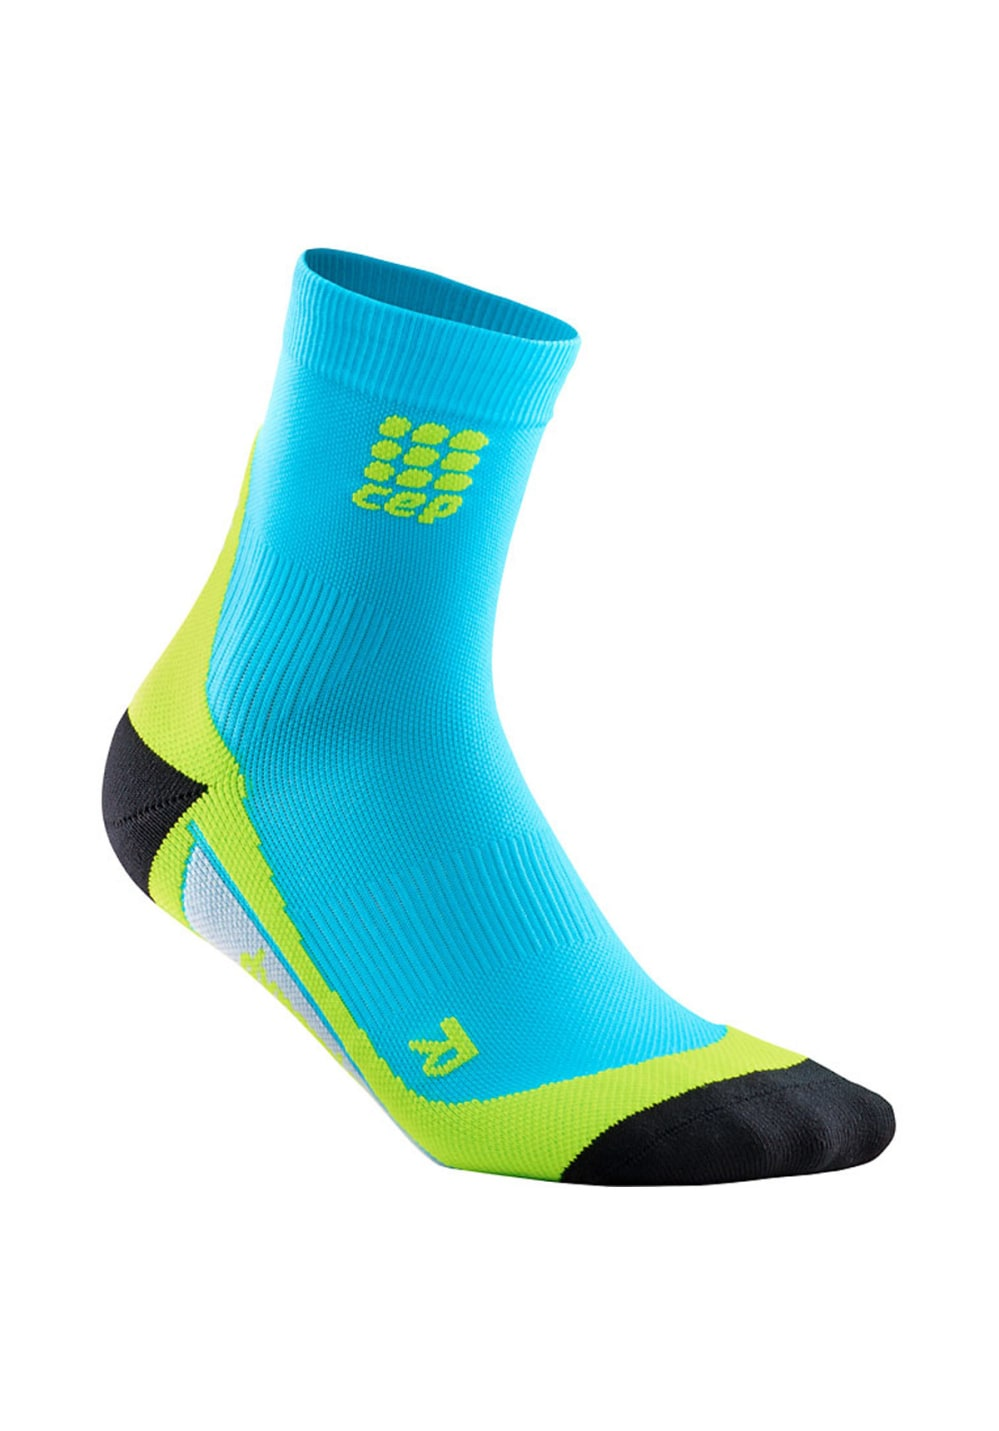 CEP Dynamic+ Short Socks Kompression Herren 26.5-29 cm, Gr. 26.5-29 cm